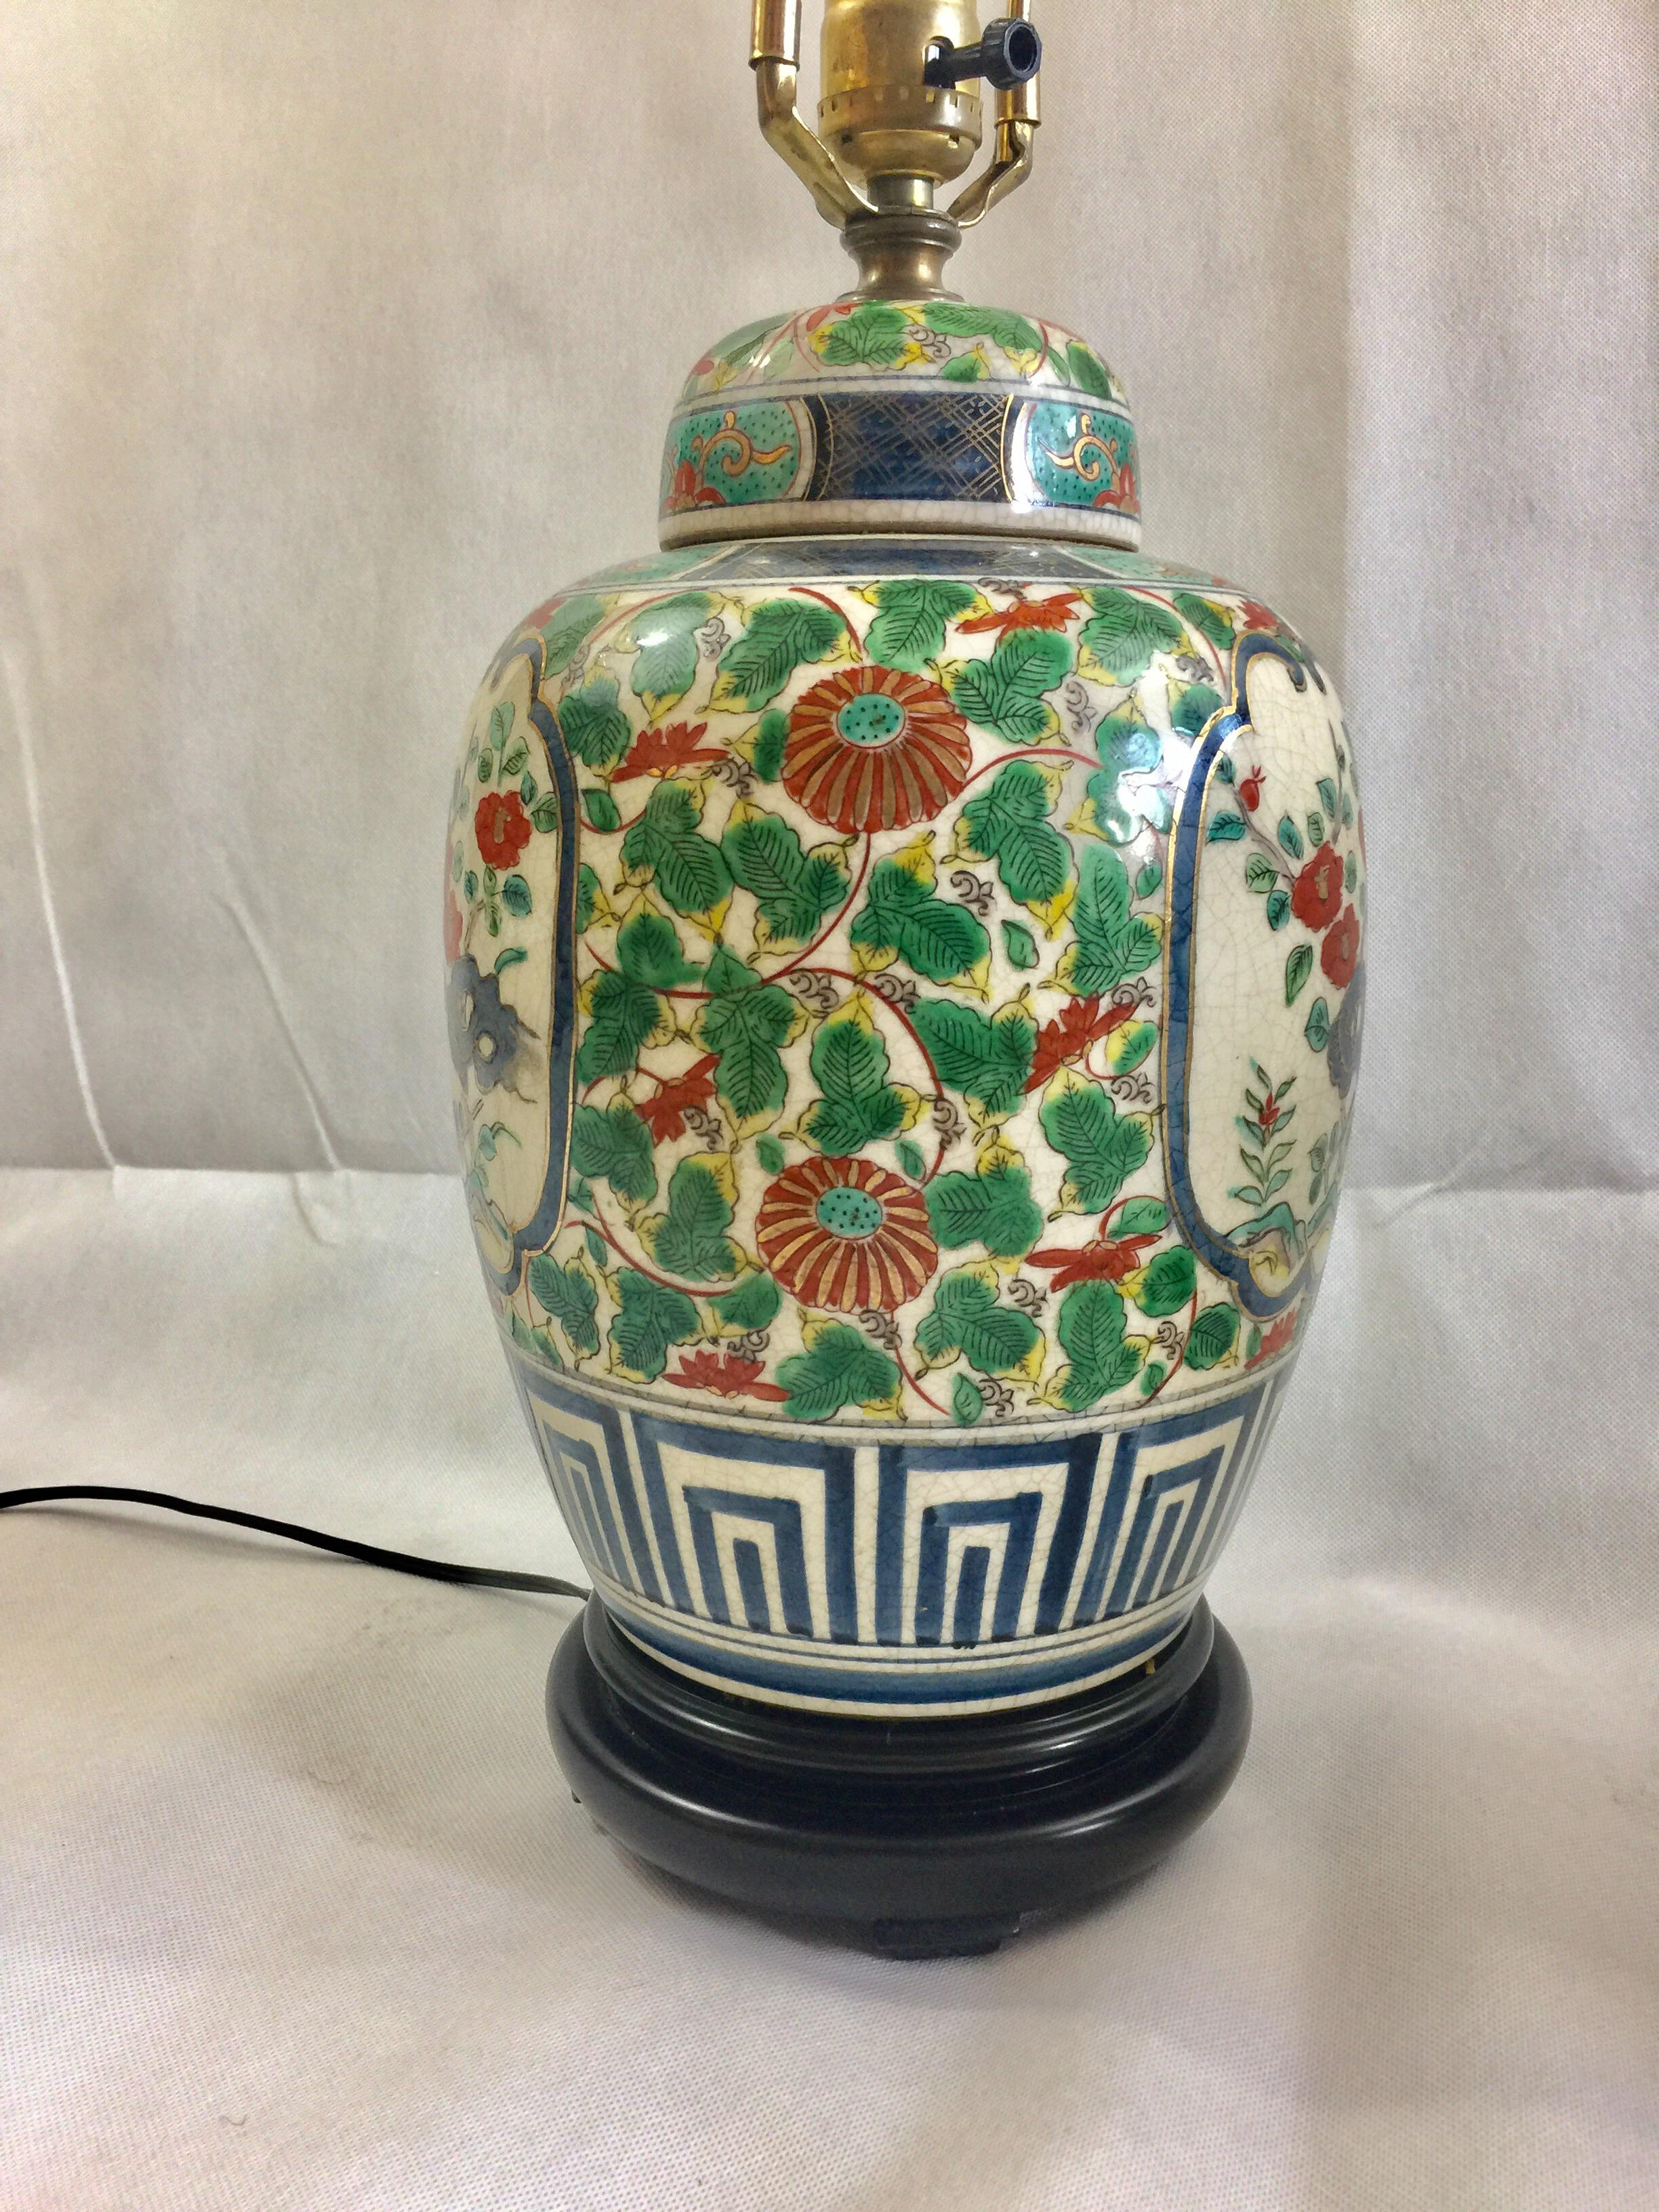 Vintage Porcelain Ginger Jar Table Lamps   A Pair   Image 5 Of 8